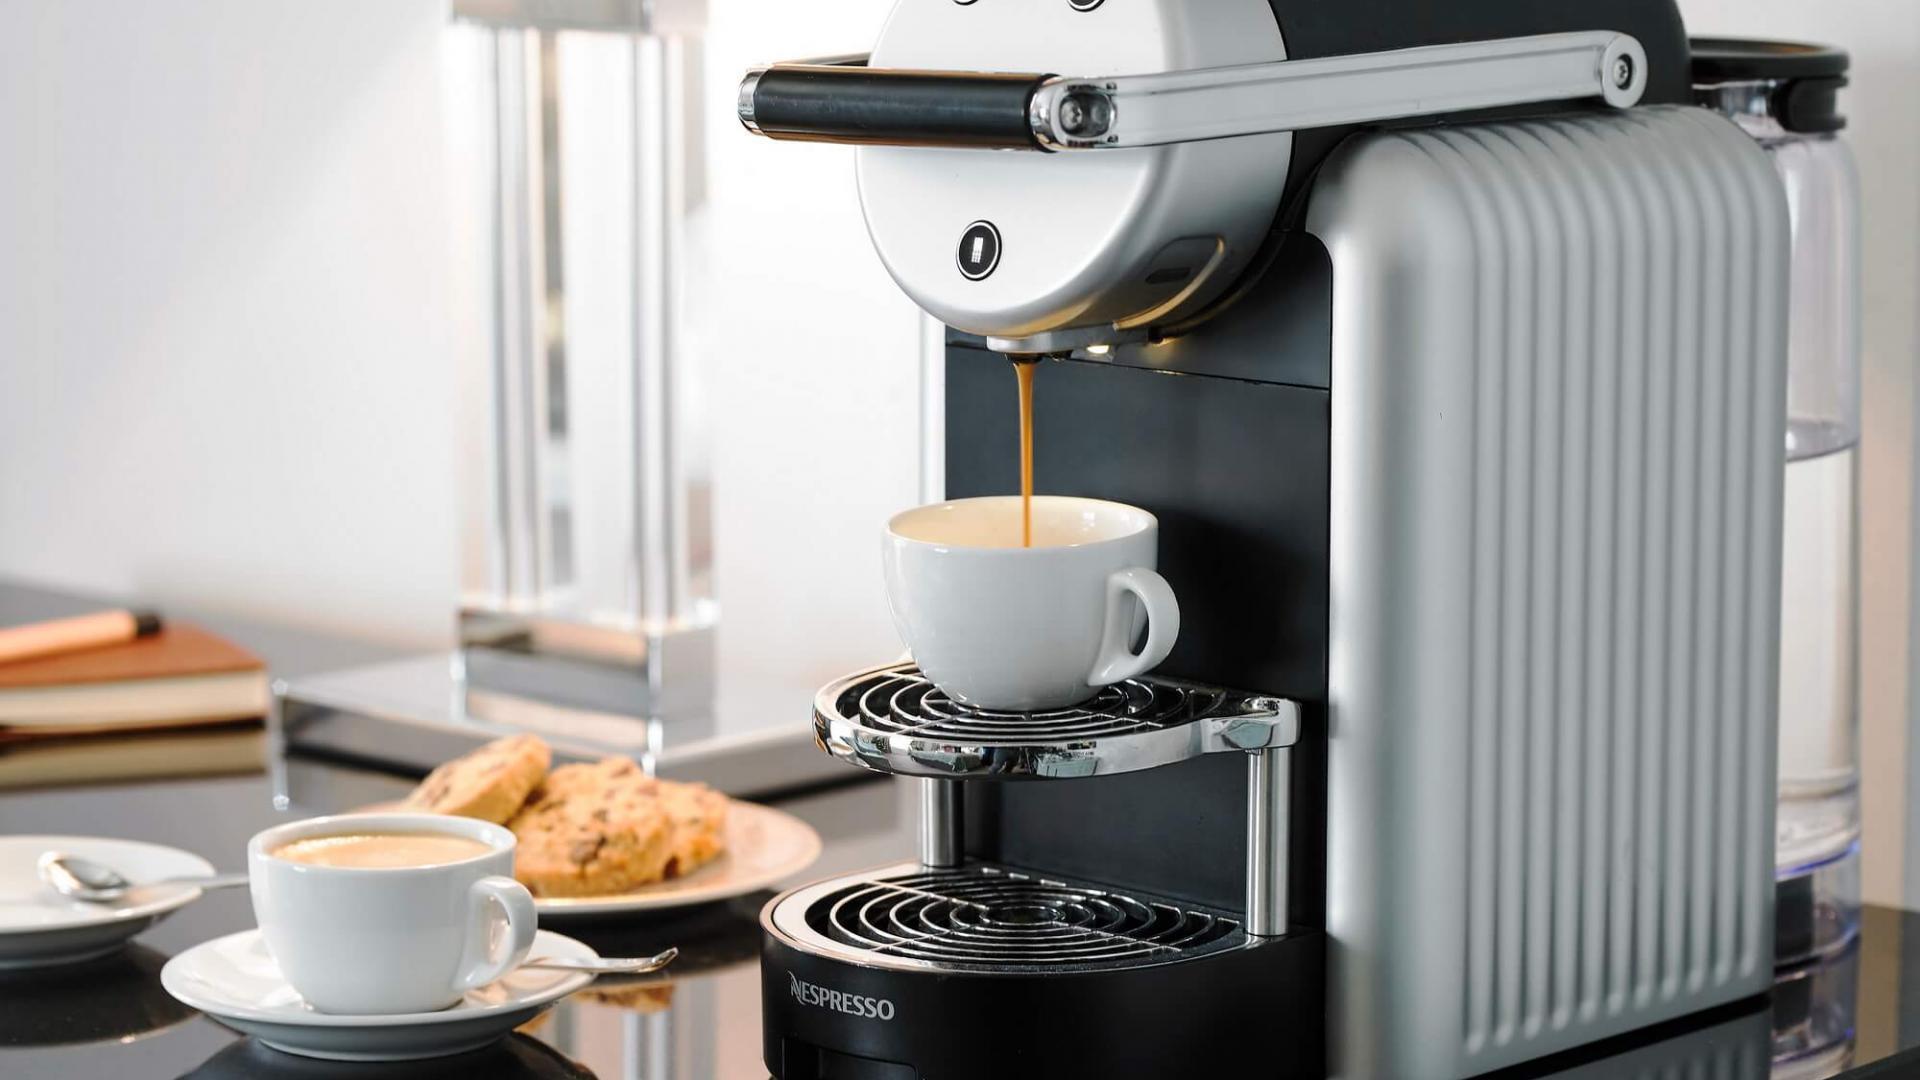 Nespresso-apparaat